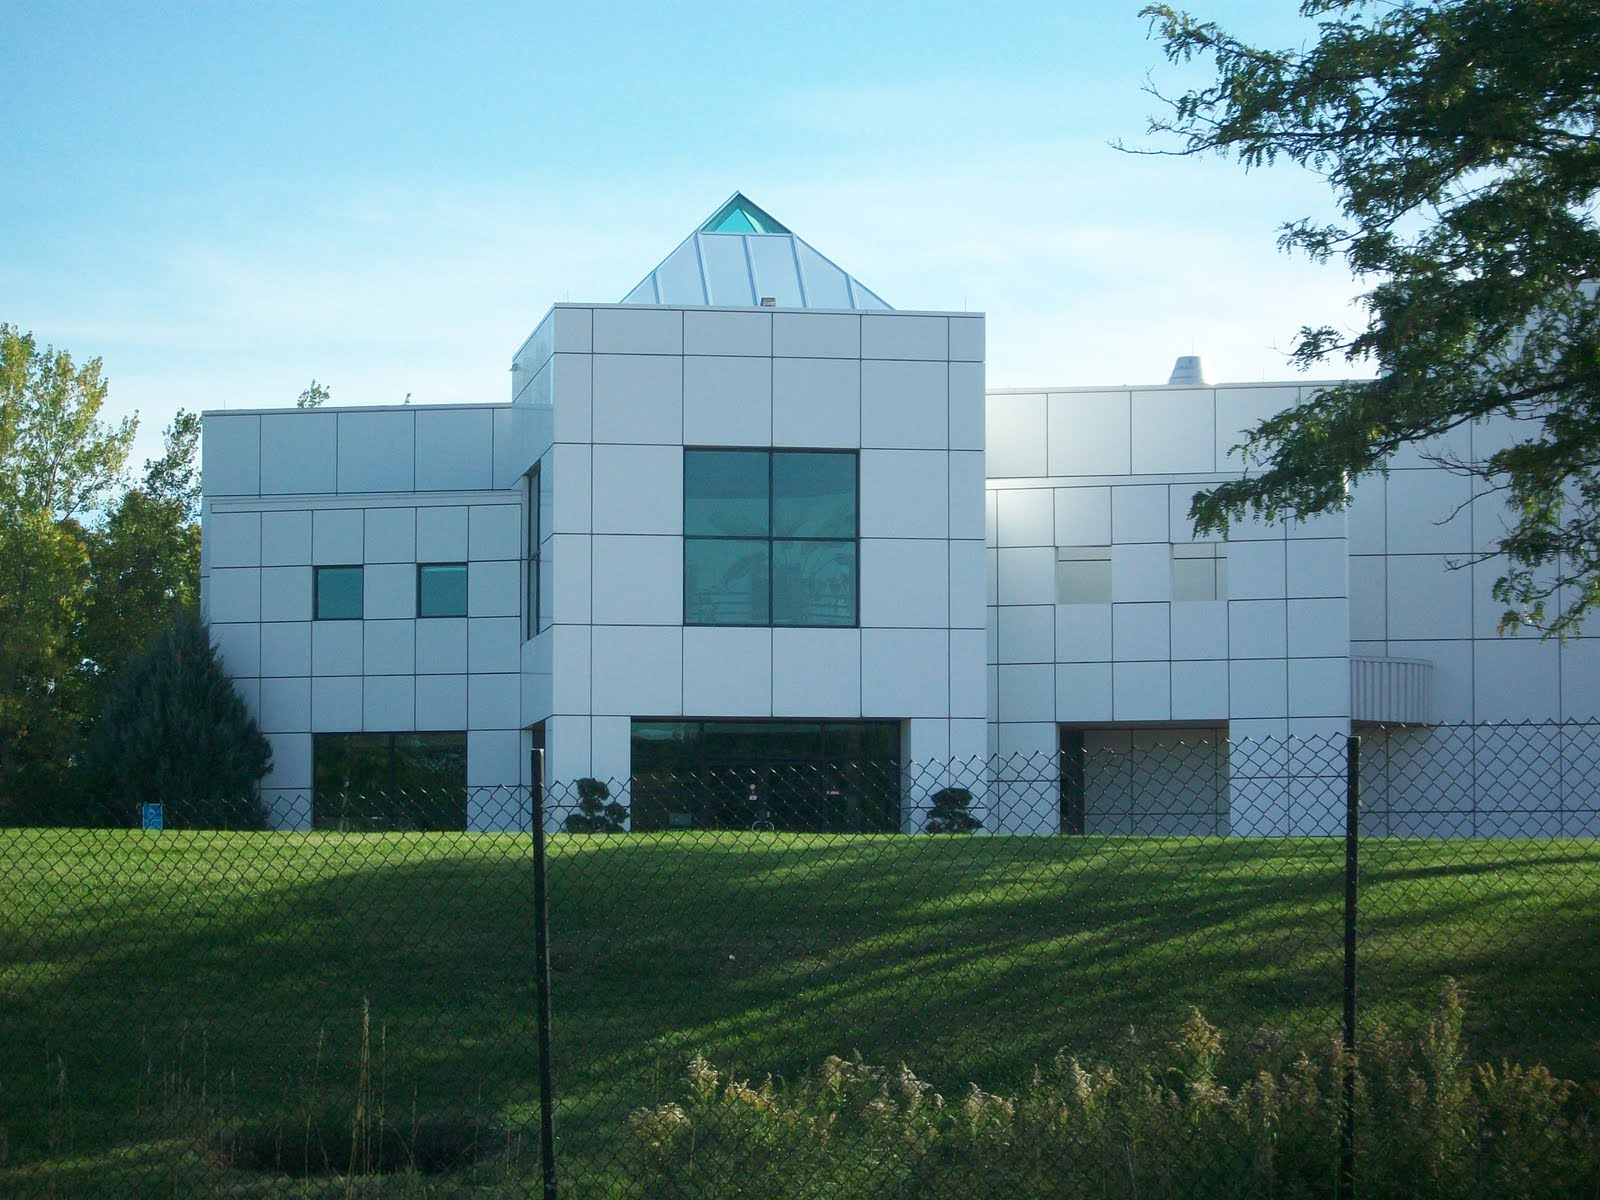 Paisley Park Studios, Chanhassen, Minnesota